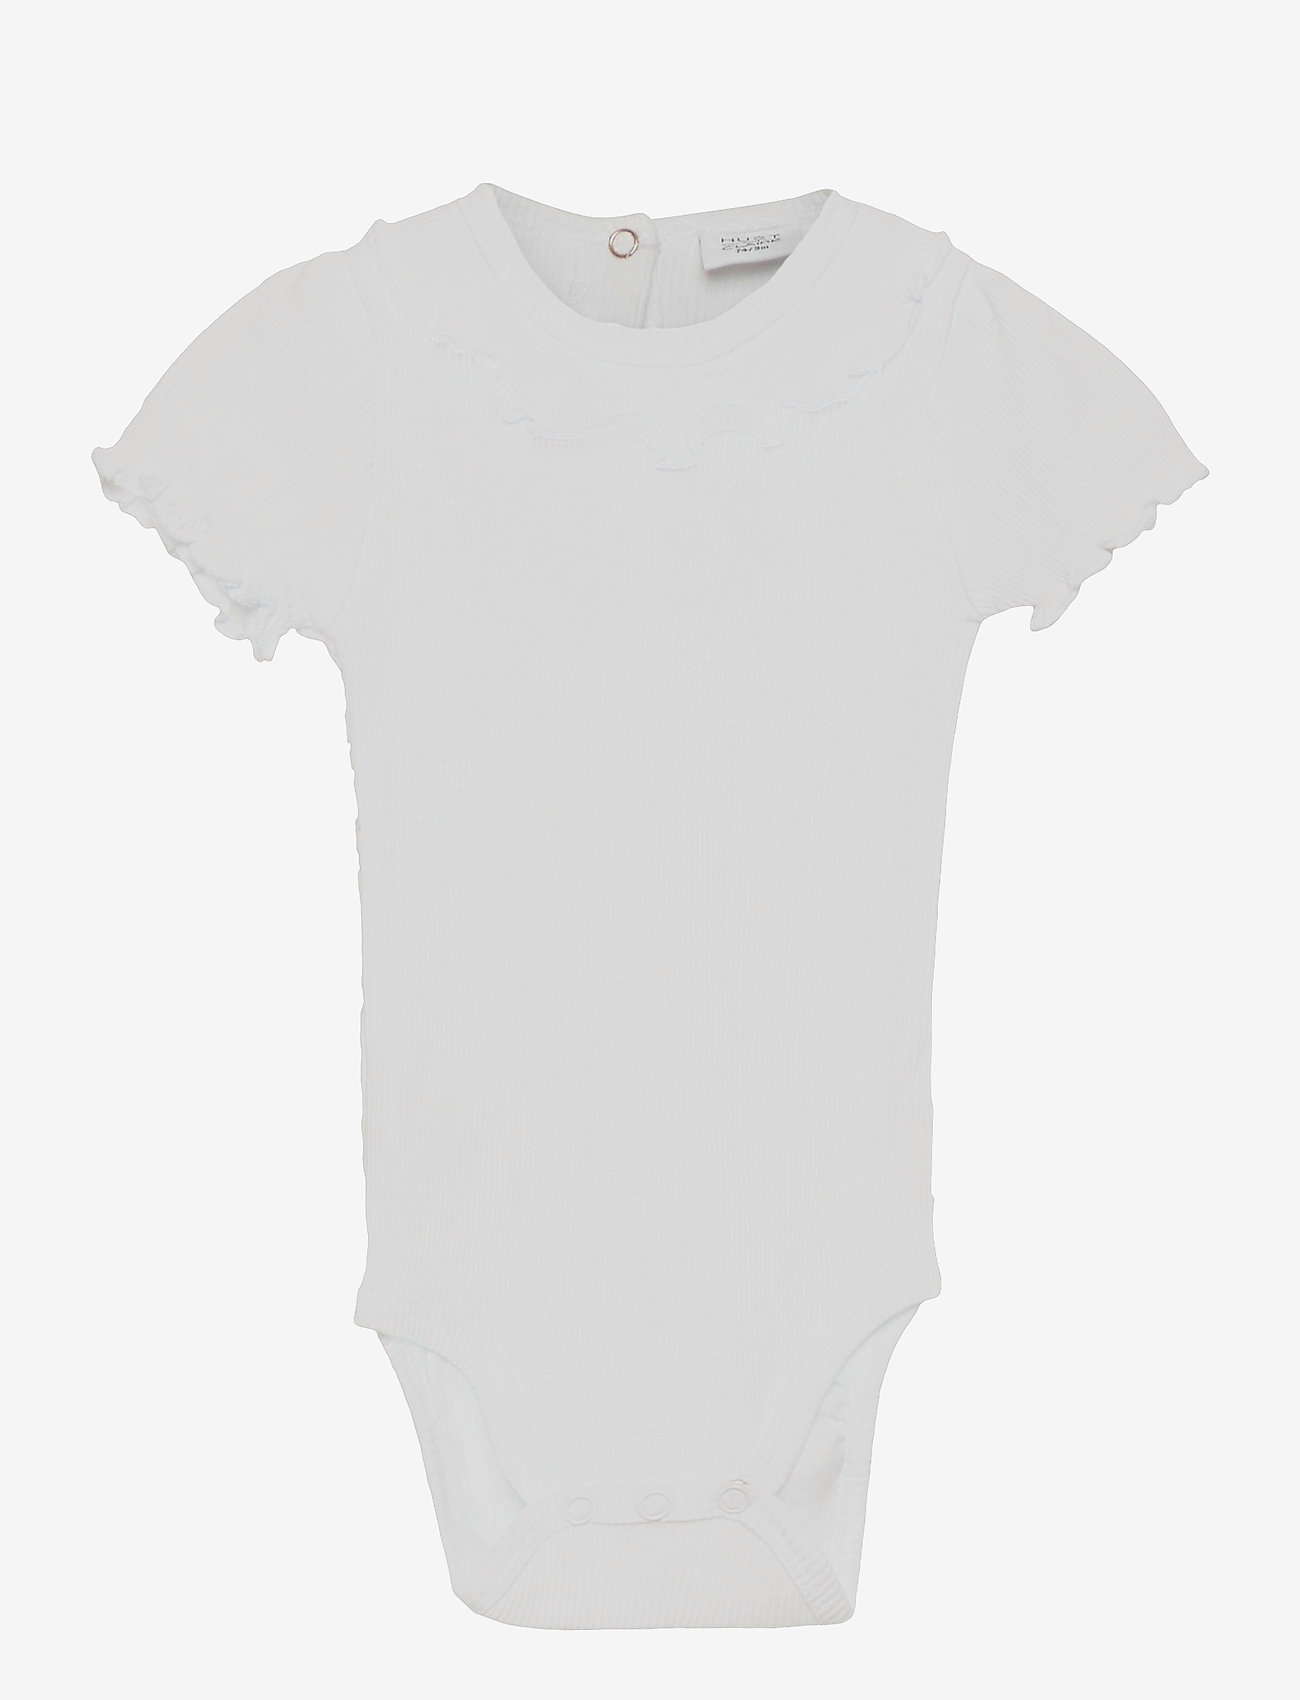 Hust & Claire - Bibbi - Bodystocking - kurzärmelige - white - 0